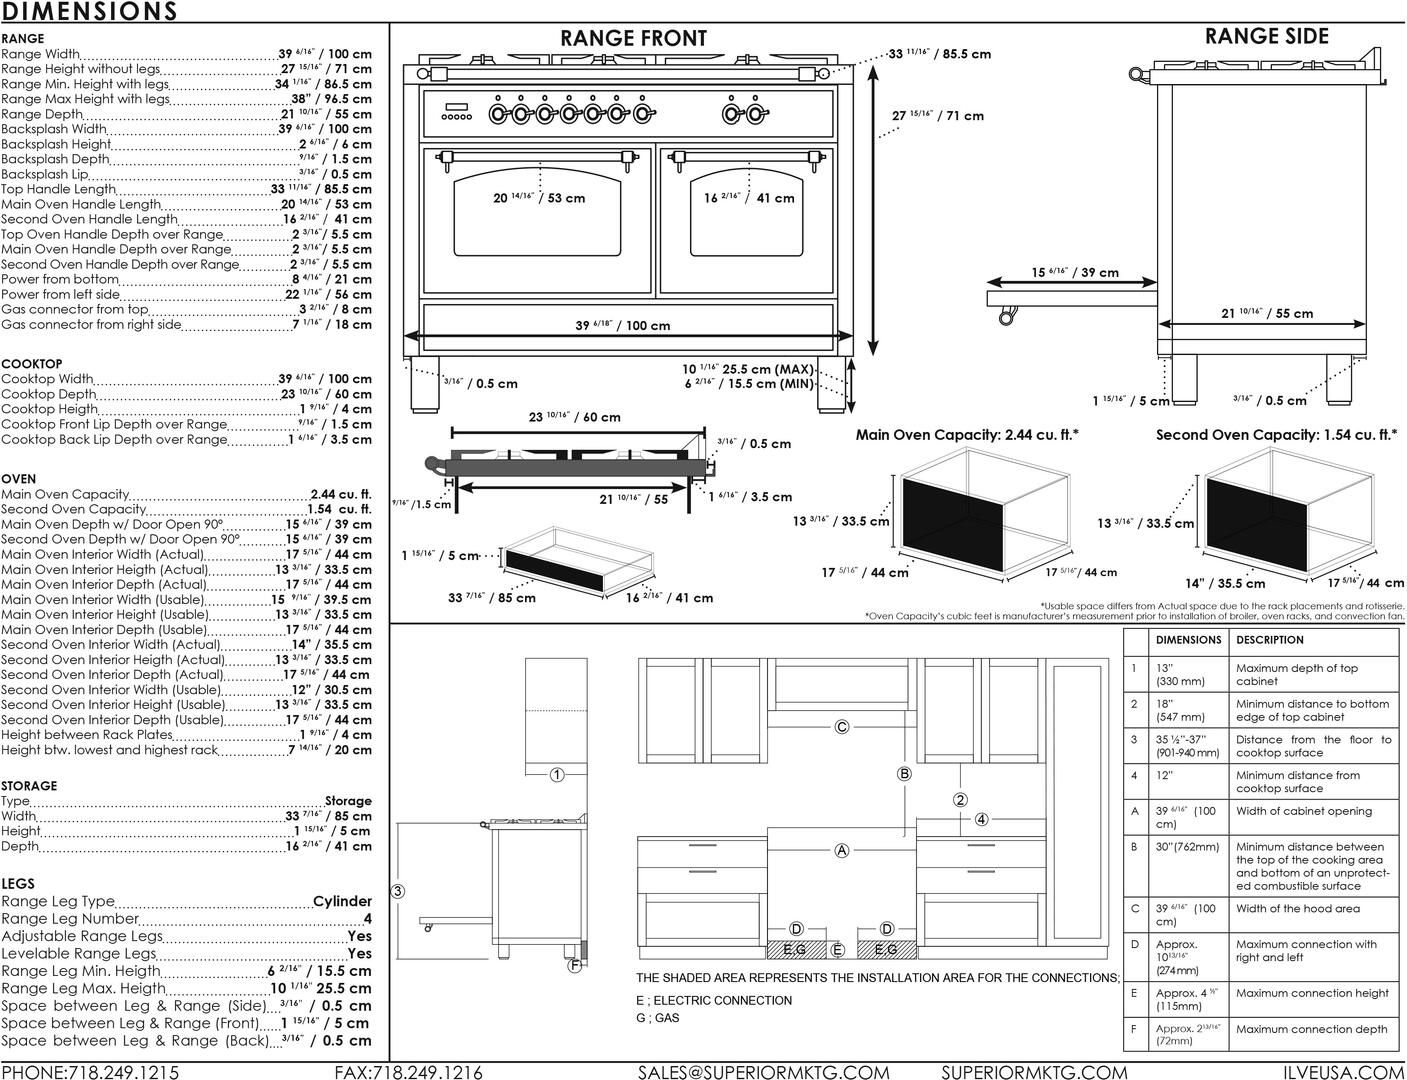 Ilve Nostalgie UPDN100FDMPVSLP Freestanding Dual Fuel Range Green, UPDN100FDM Dimensions Guide